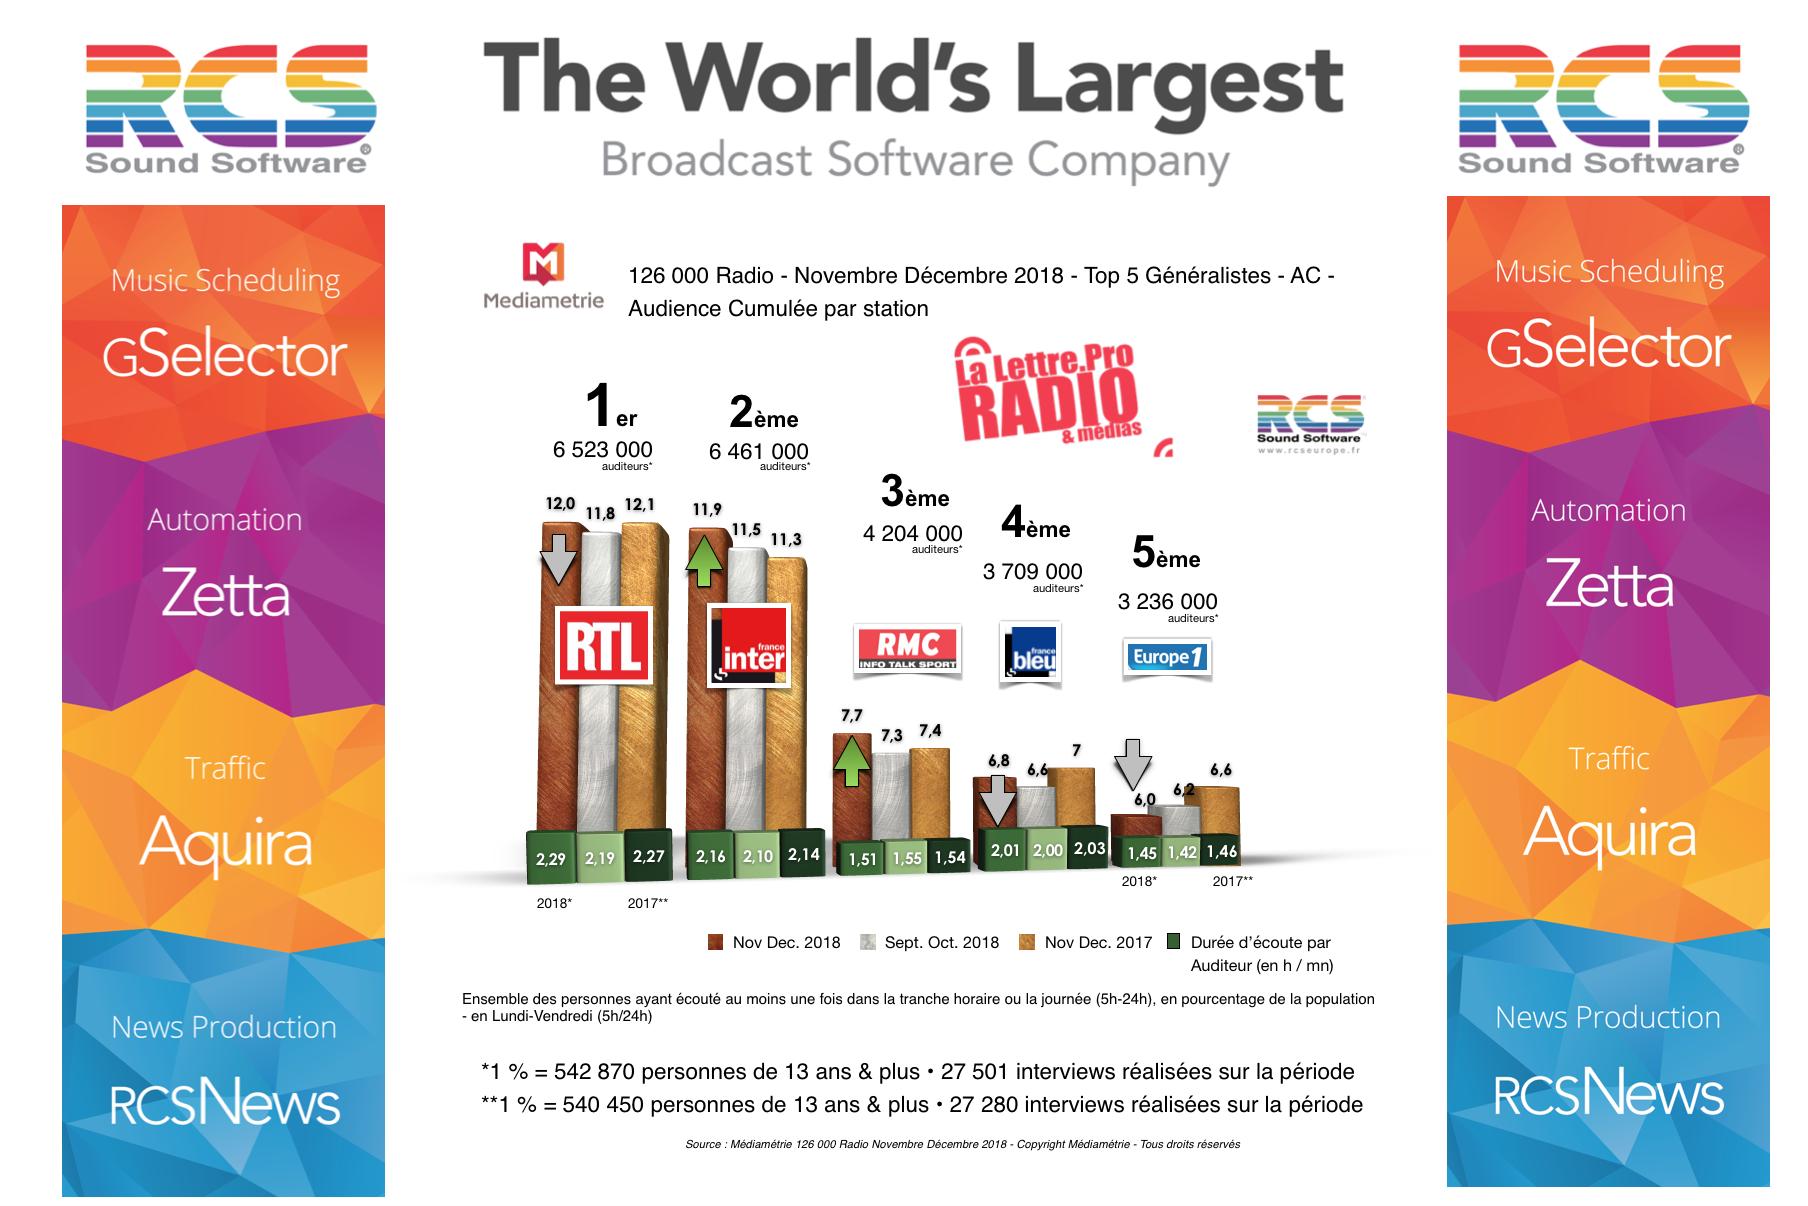 Diagramme exclusif LLP/RCS GSelector 4 - TOP 5 radios Généralistes en Lundi-Vendredi - 126 000 Radio Novembre-Décembre 2018